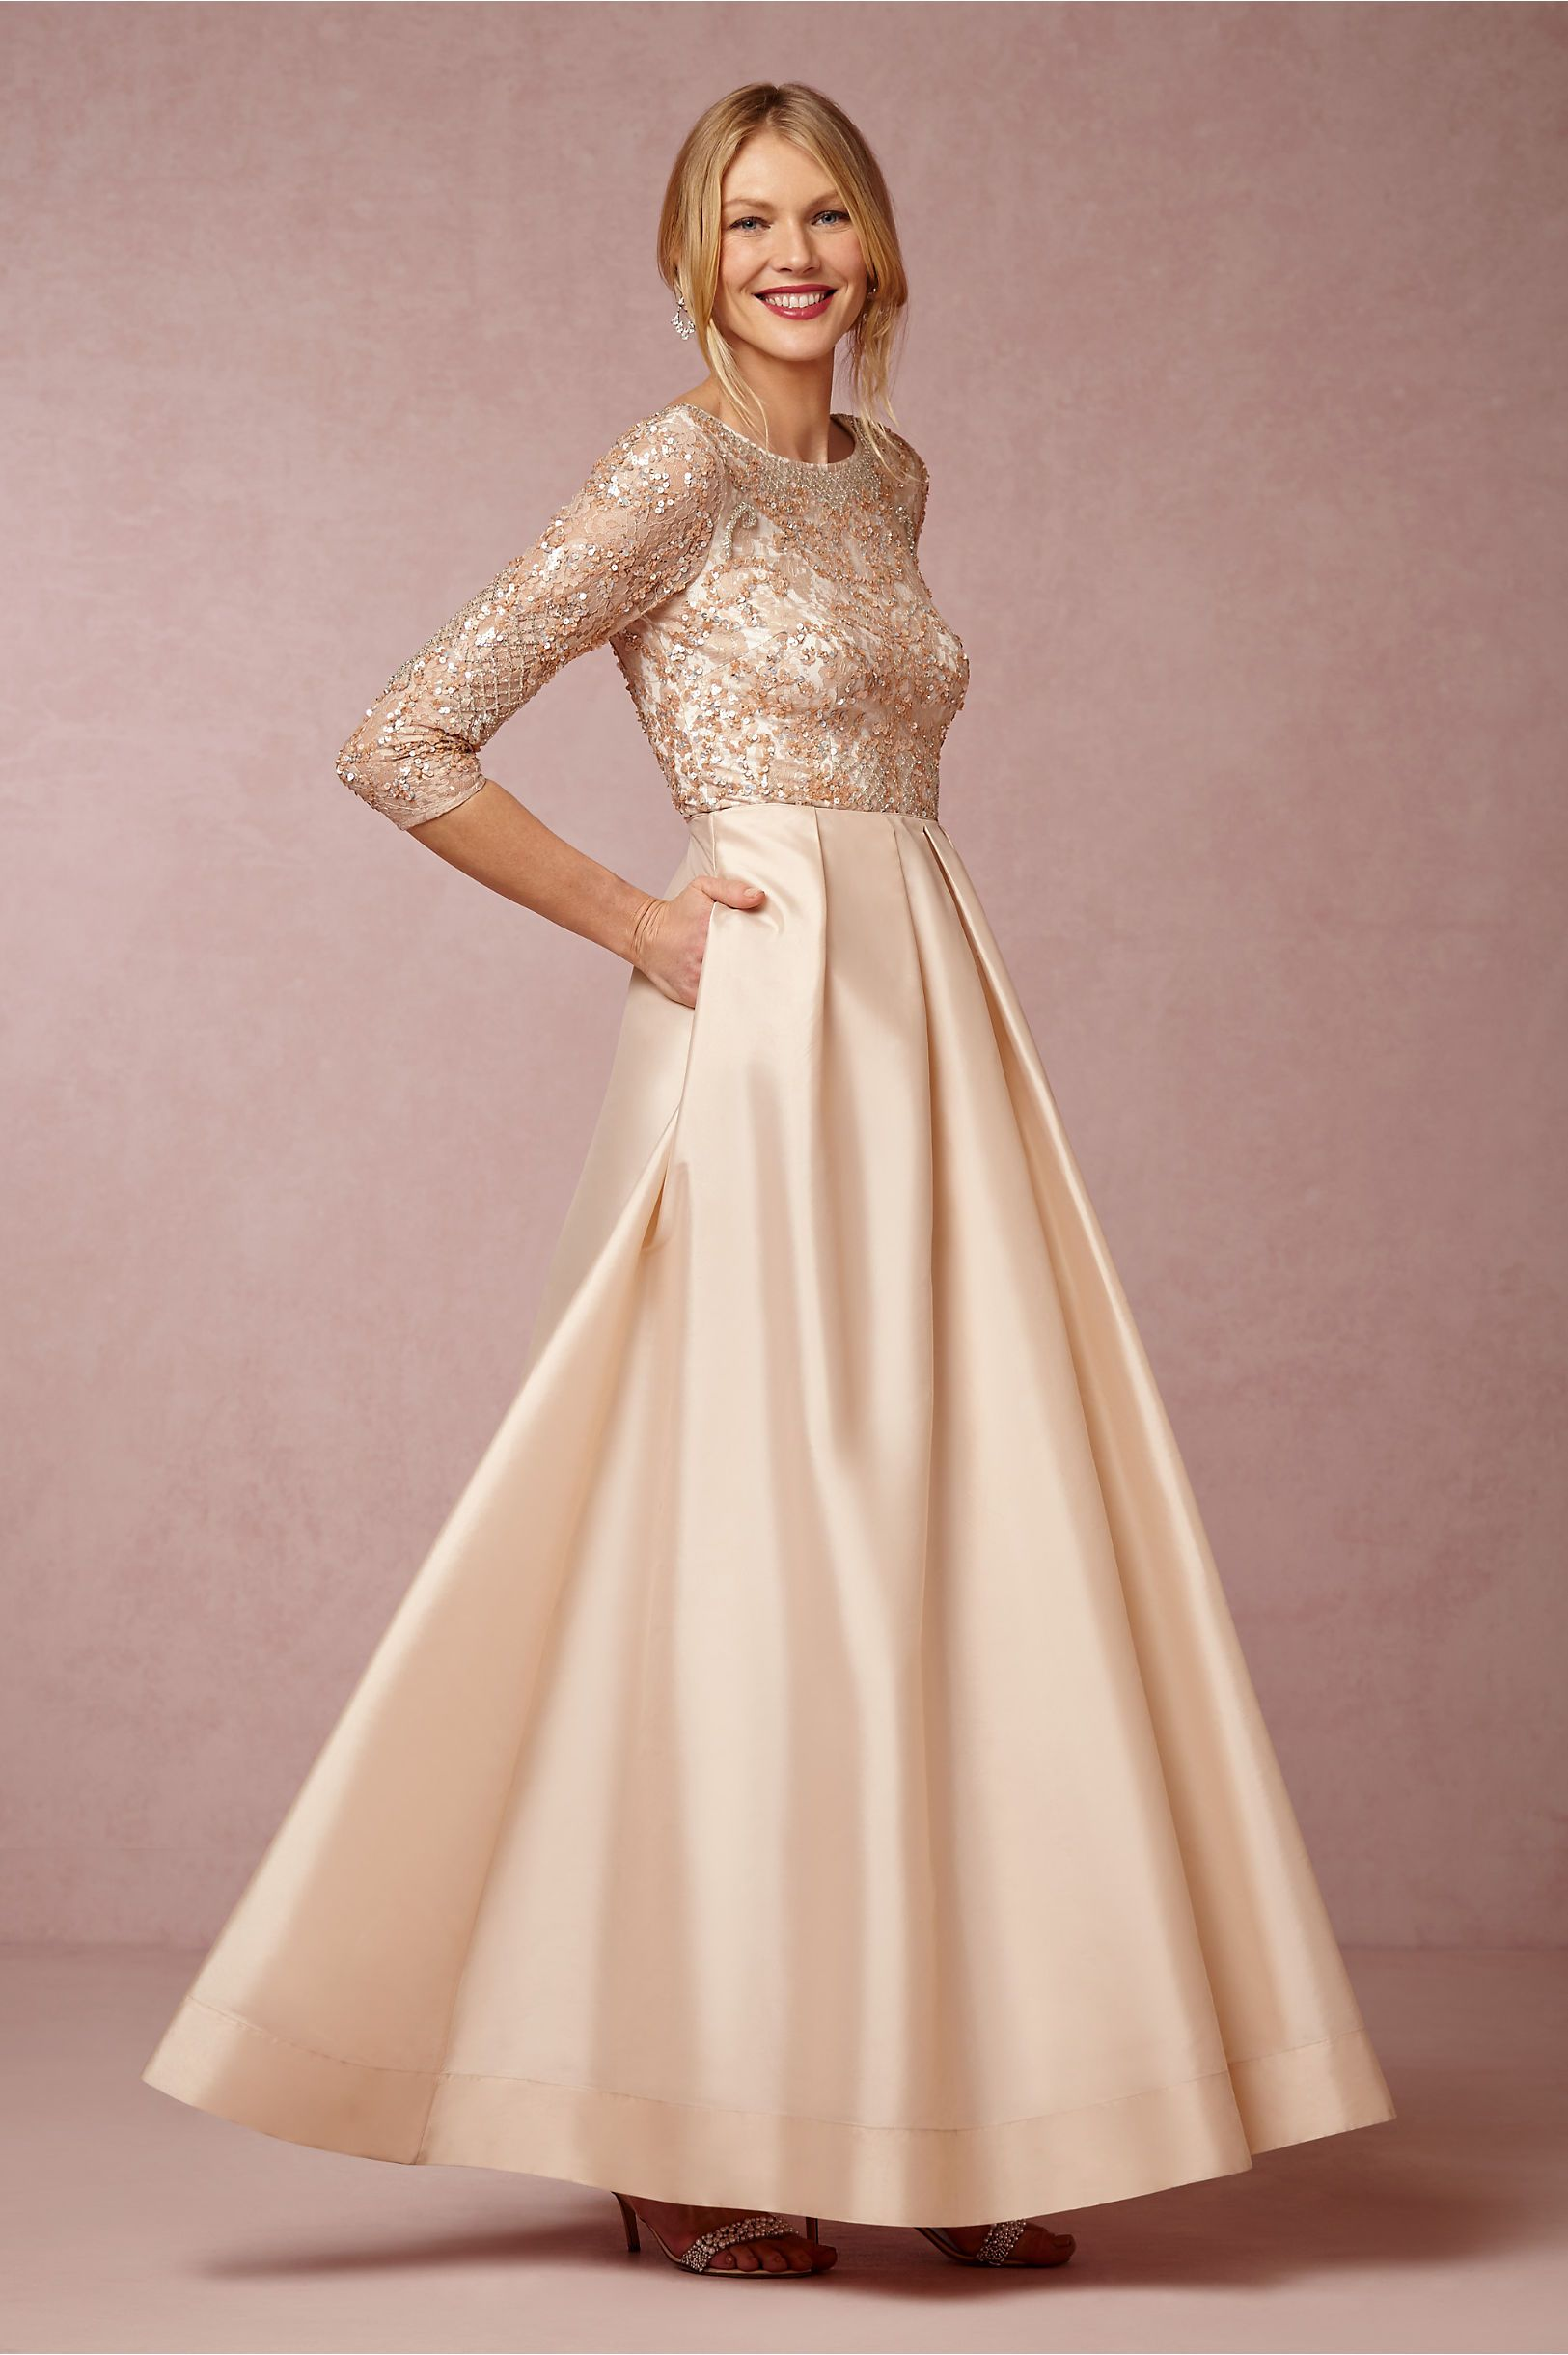 fb1aa1c278 Wedding Dresses Under $500 - A Practical Wedding: Blog Ideas for the Modern  Wedding, Plus Marriage